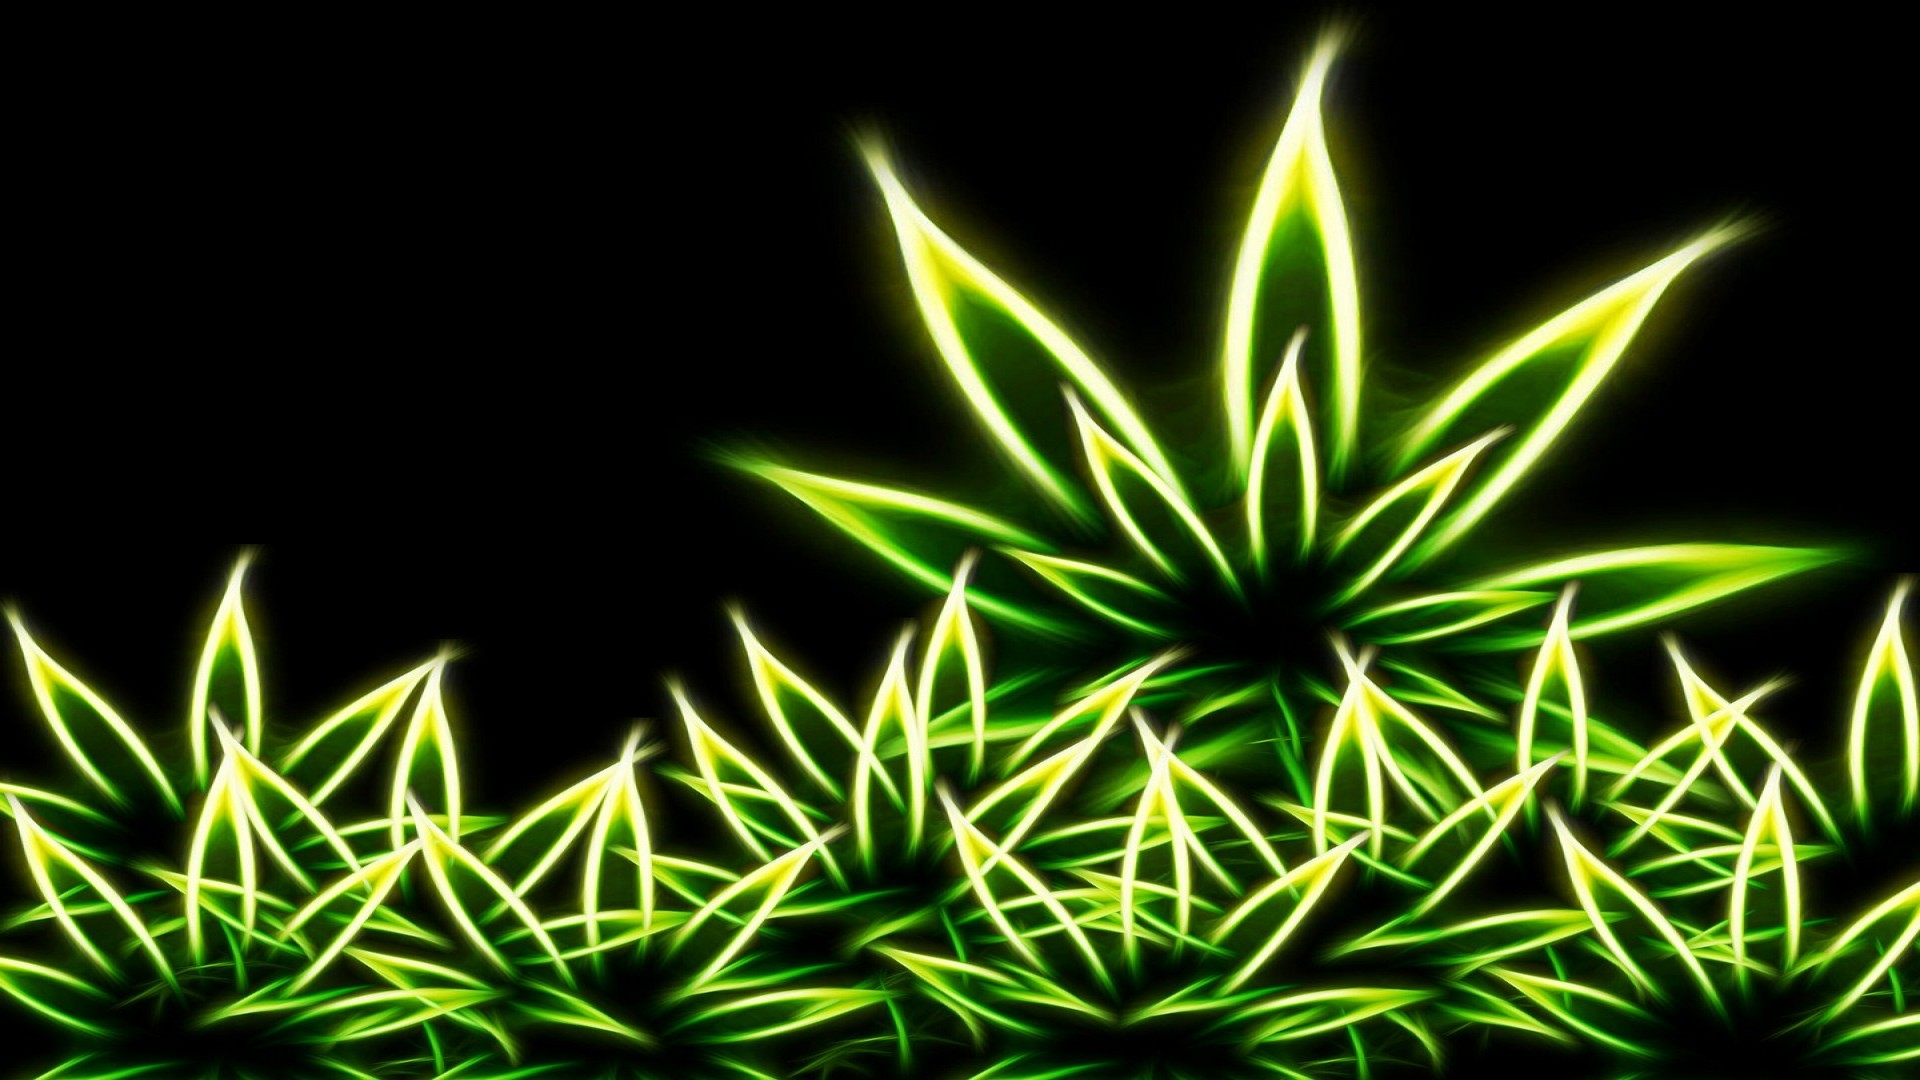 Animated Marijuana Wallpaper Animated Marijuana Wallpaper